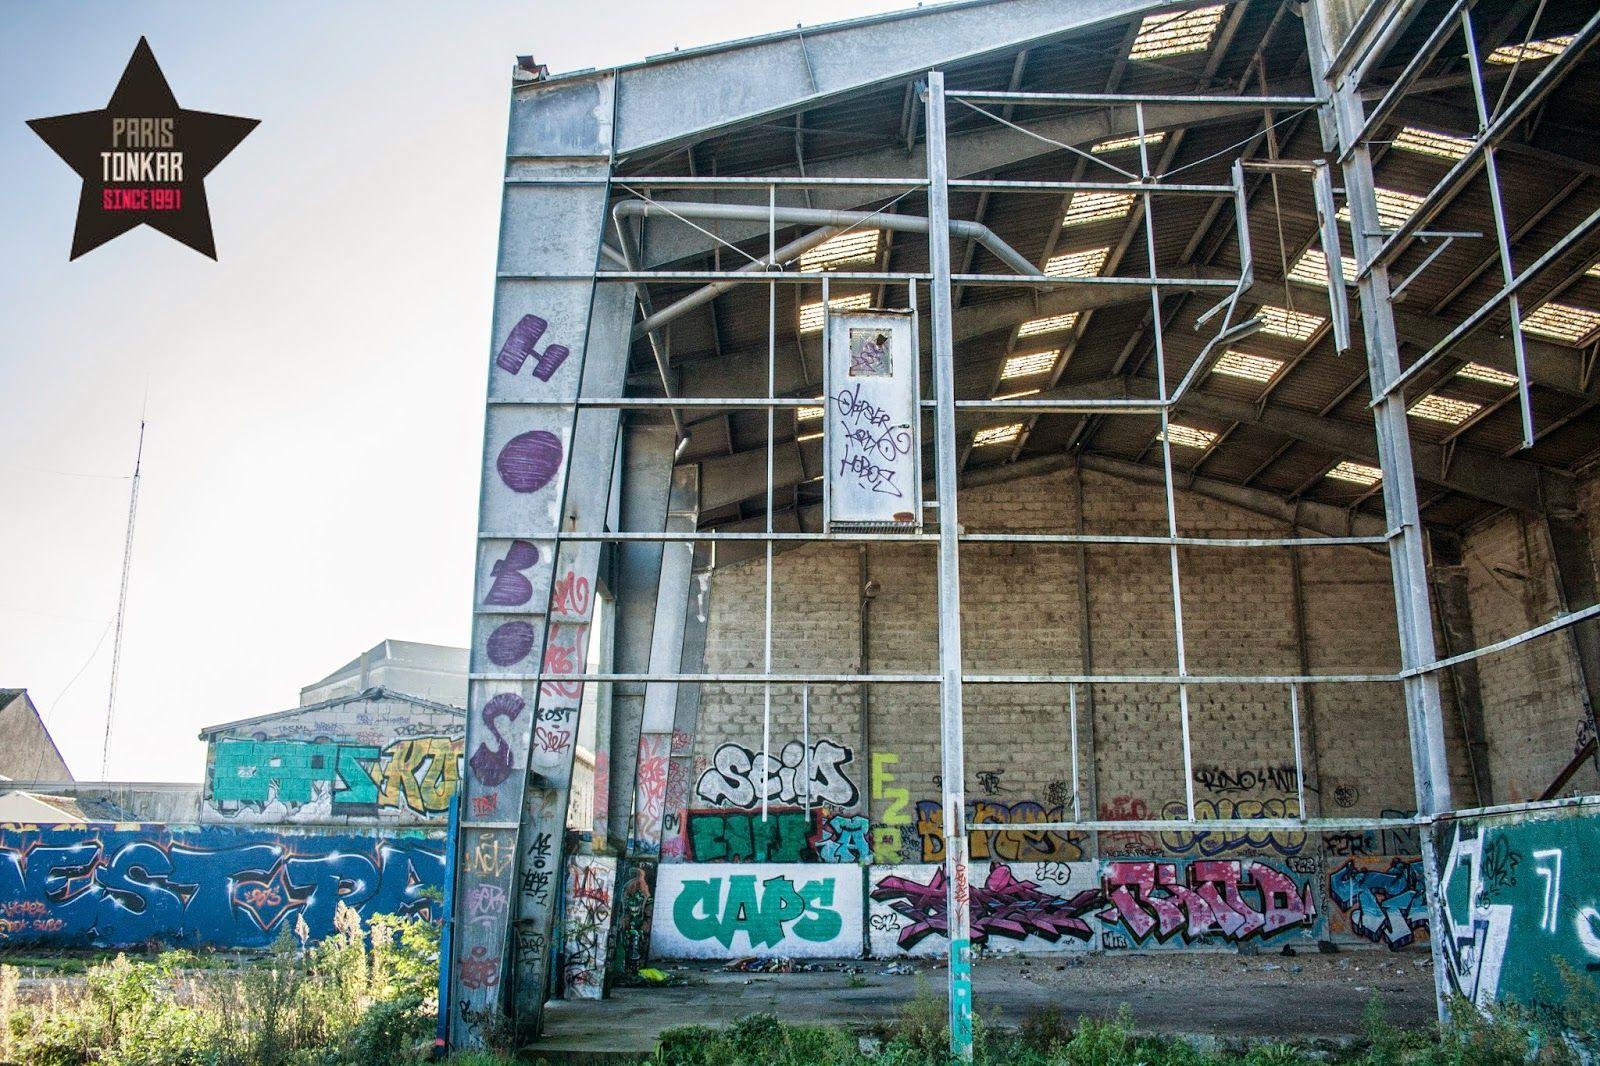 [Paris Tonkar magazine] #graffiti #streetart #urban #lifestyle: Graffiti, street et plus encore... Par Ninnog Gautron